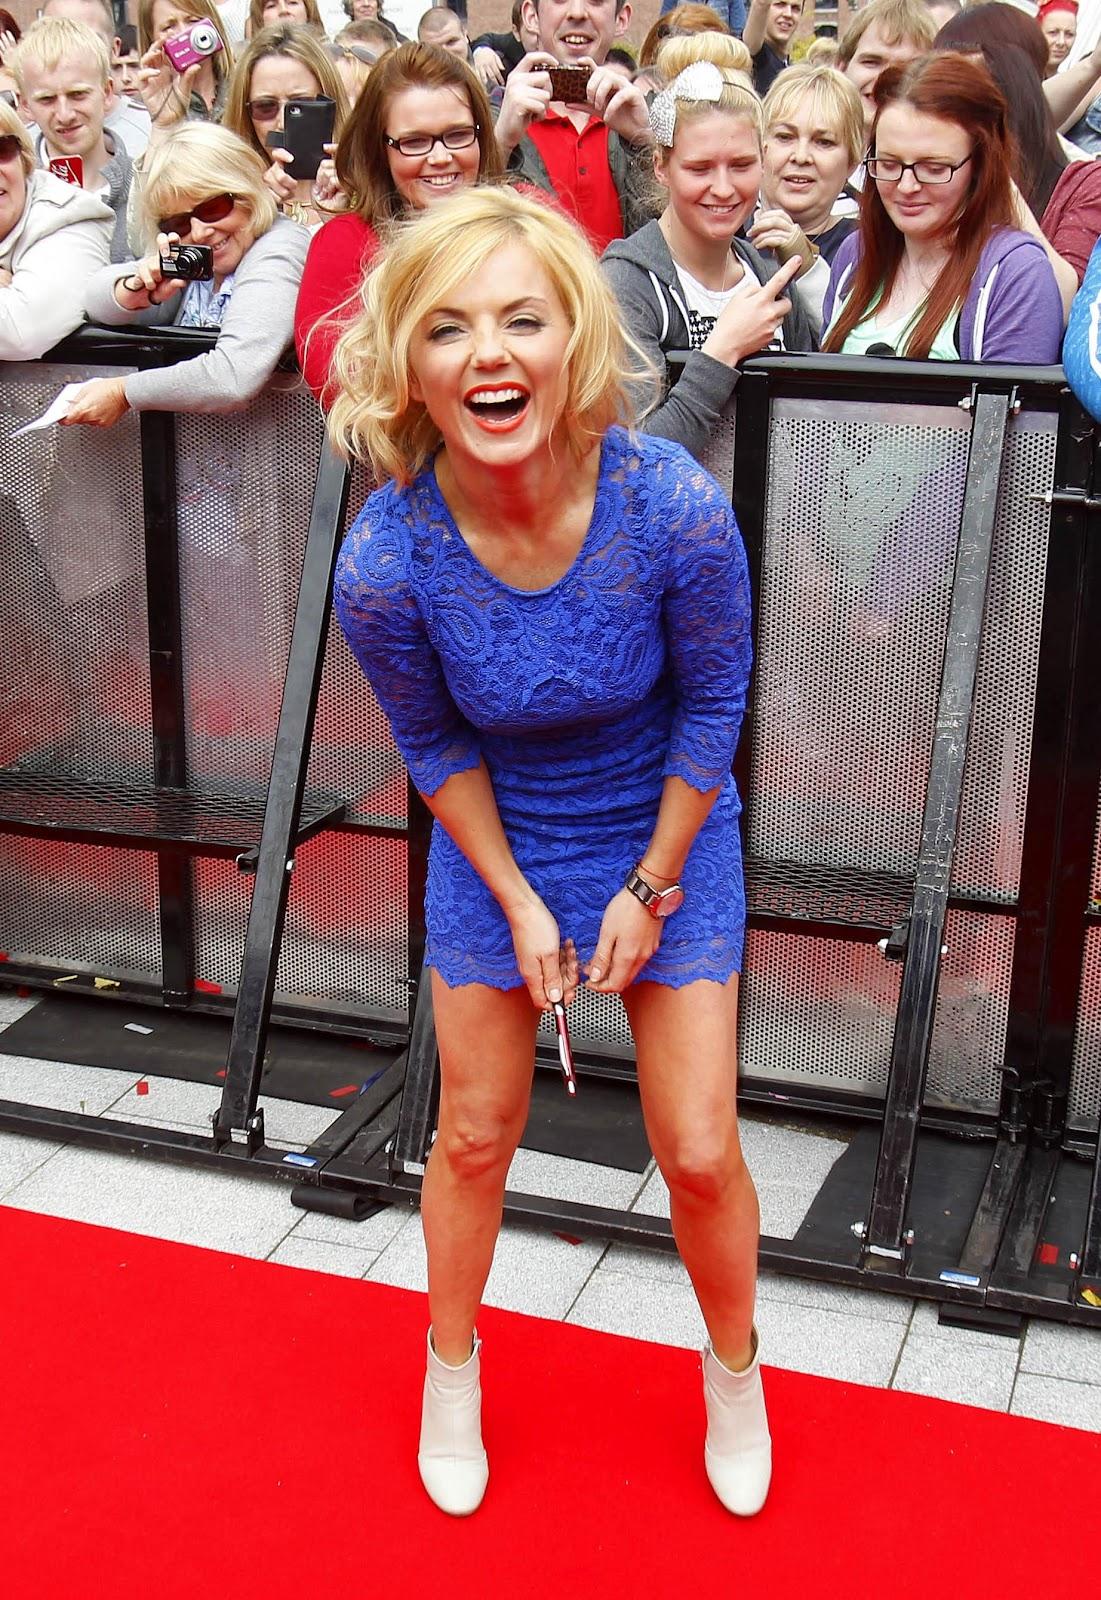 http://4.bp.blogspot.com/-M2uhXN4lED4/T7_T7wS85GI/AAAAAAAABbU/vR-sF5luozw/s1600/Geri+Halliwell+Hairy+Upskirt+X+Factor+In+Liverpool+www.GutterUncensored.com+007.jpg